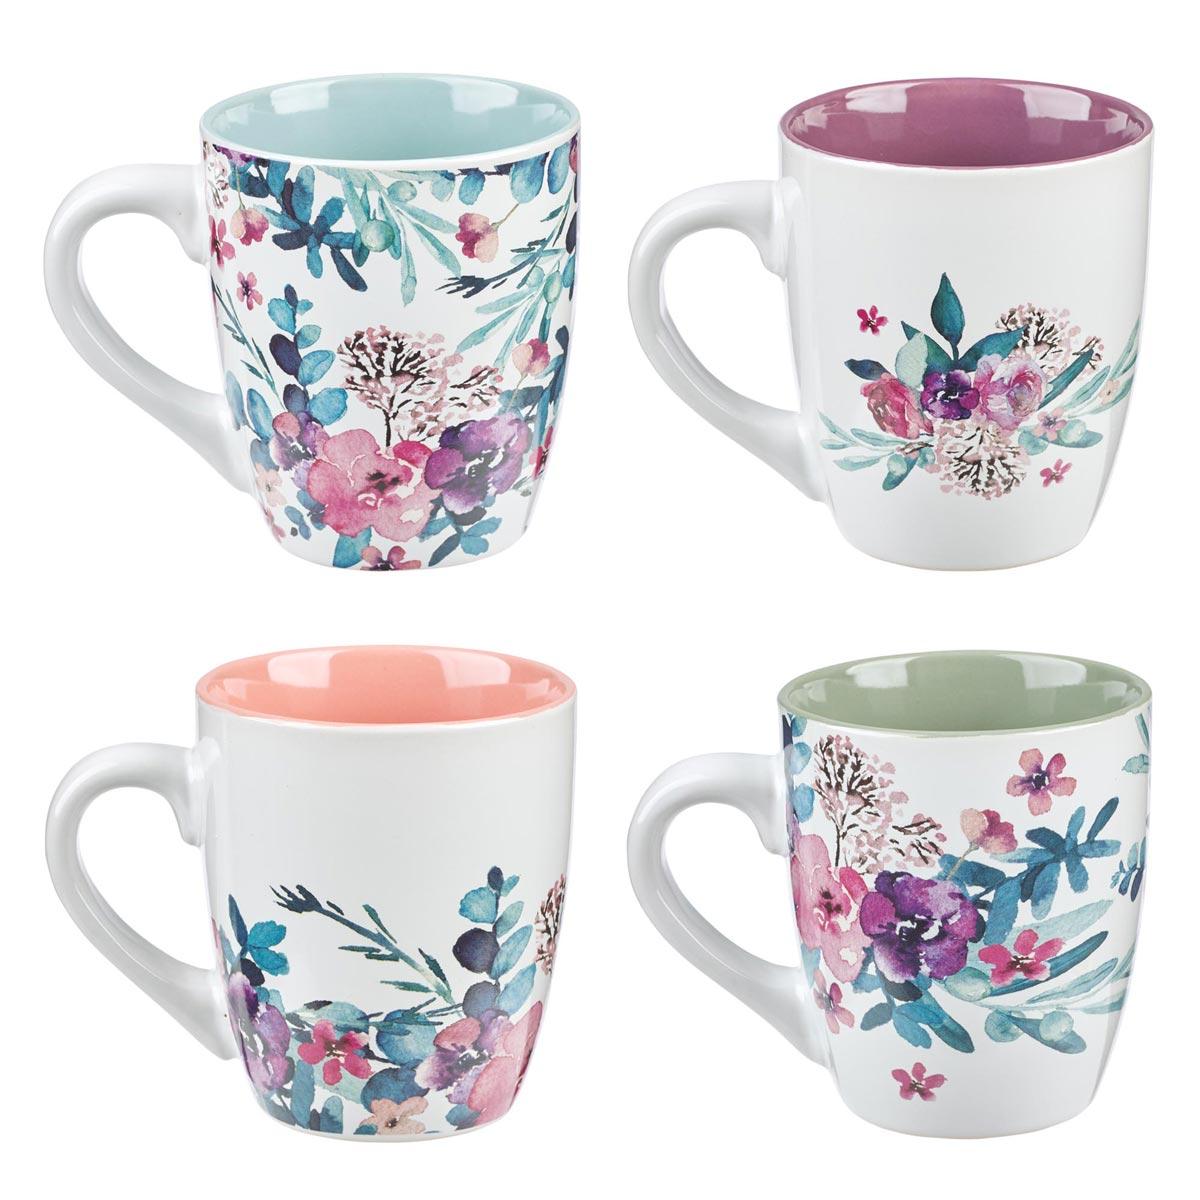 Best Dad Ceramic Little Wishes Mug In Spotty Gift Bag Lovely Mugs Gift Idea